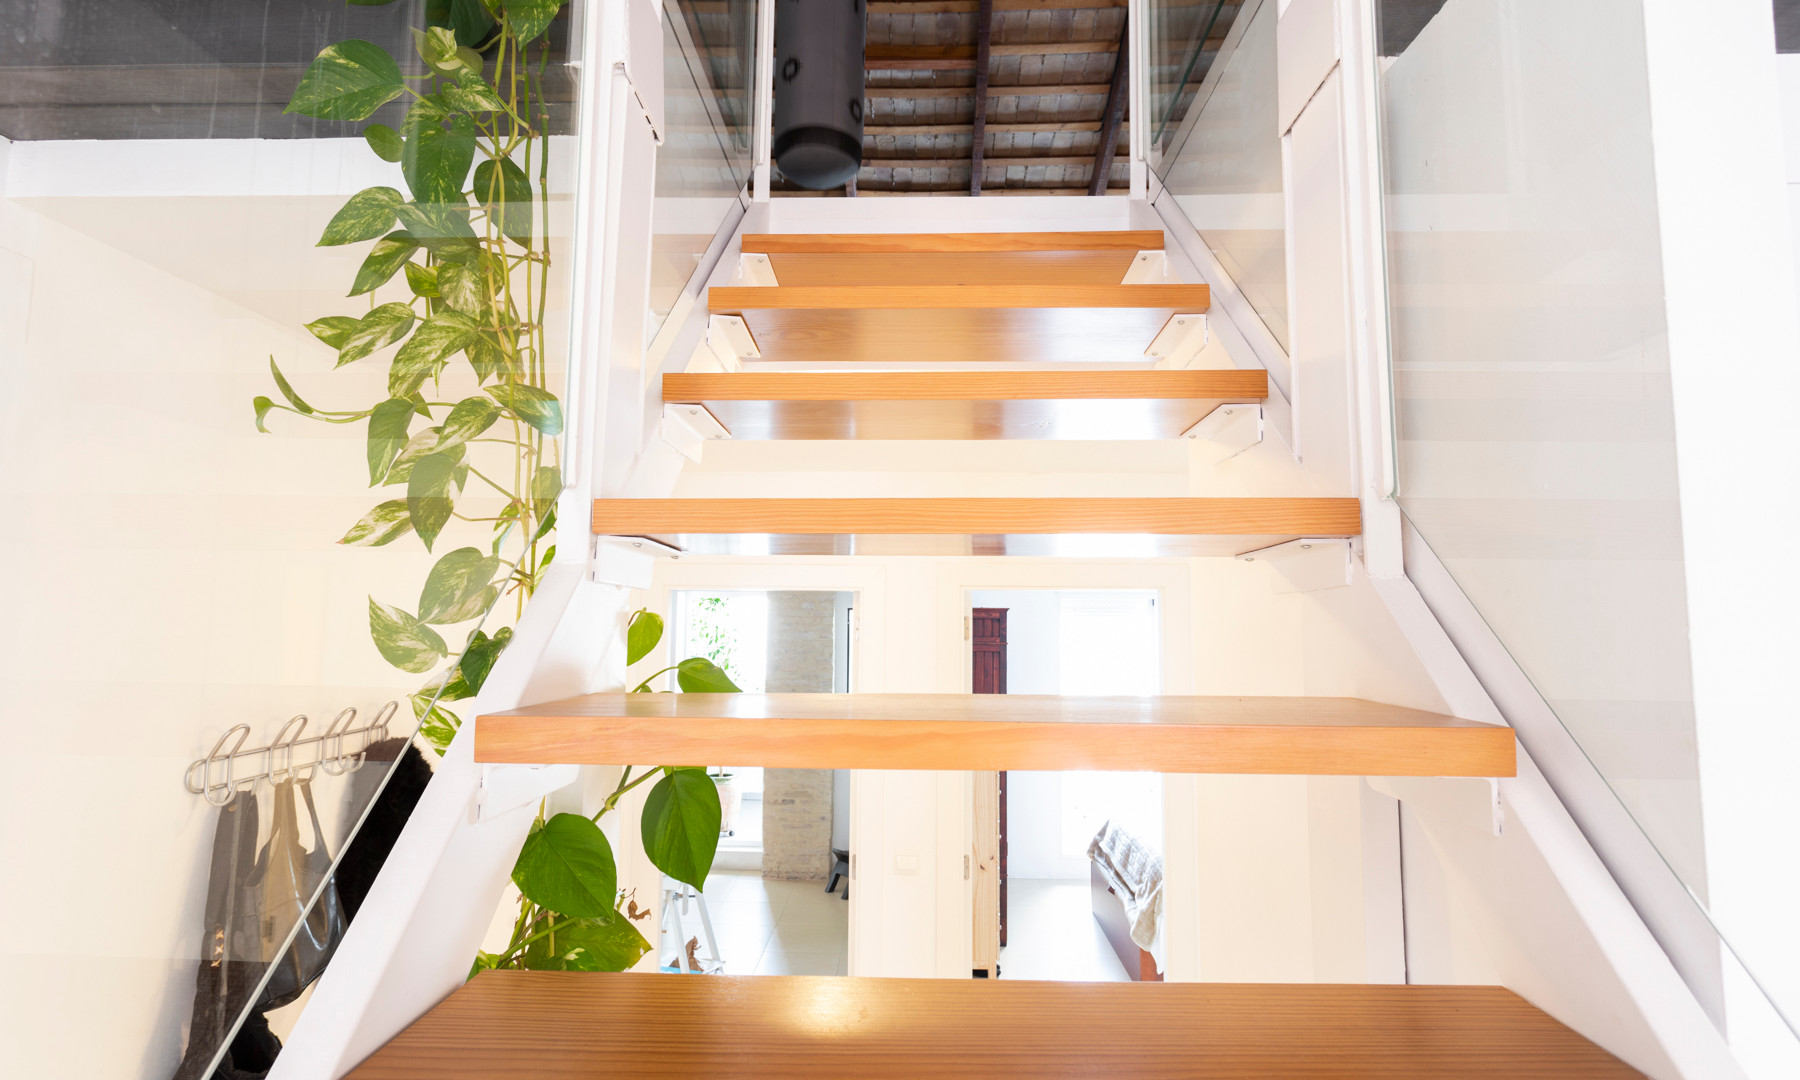 181224-Paco-Sanchis-Arquitectura-0090.jp